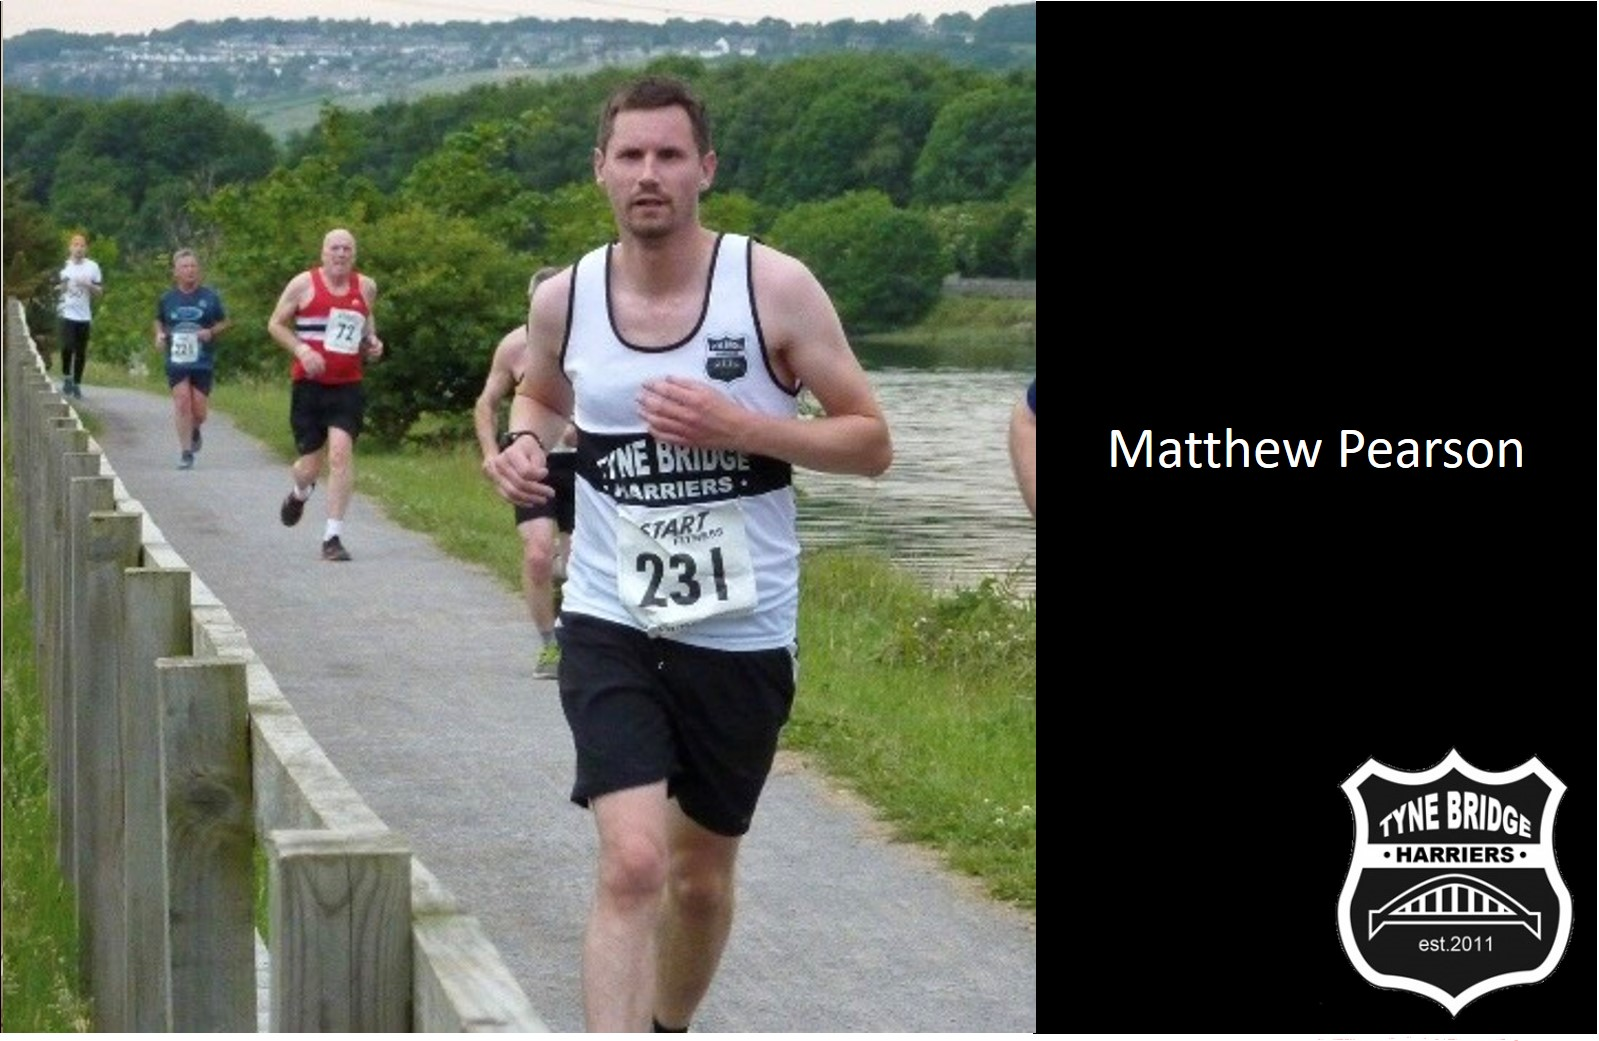 Matthew Pearson